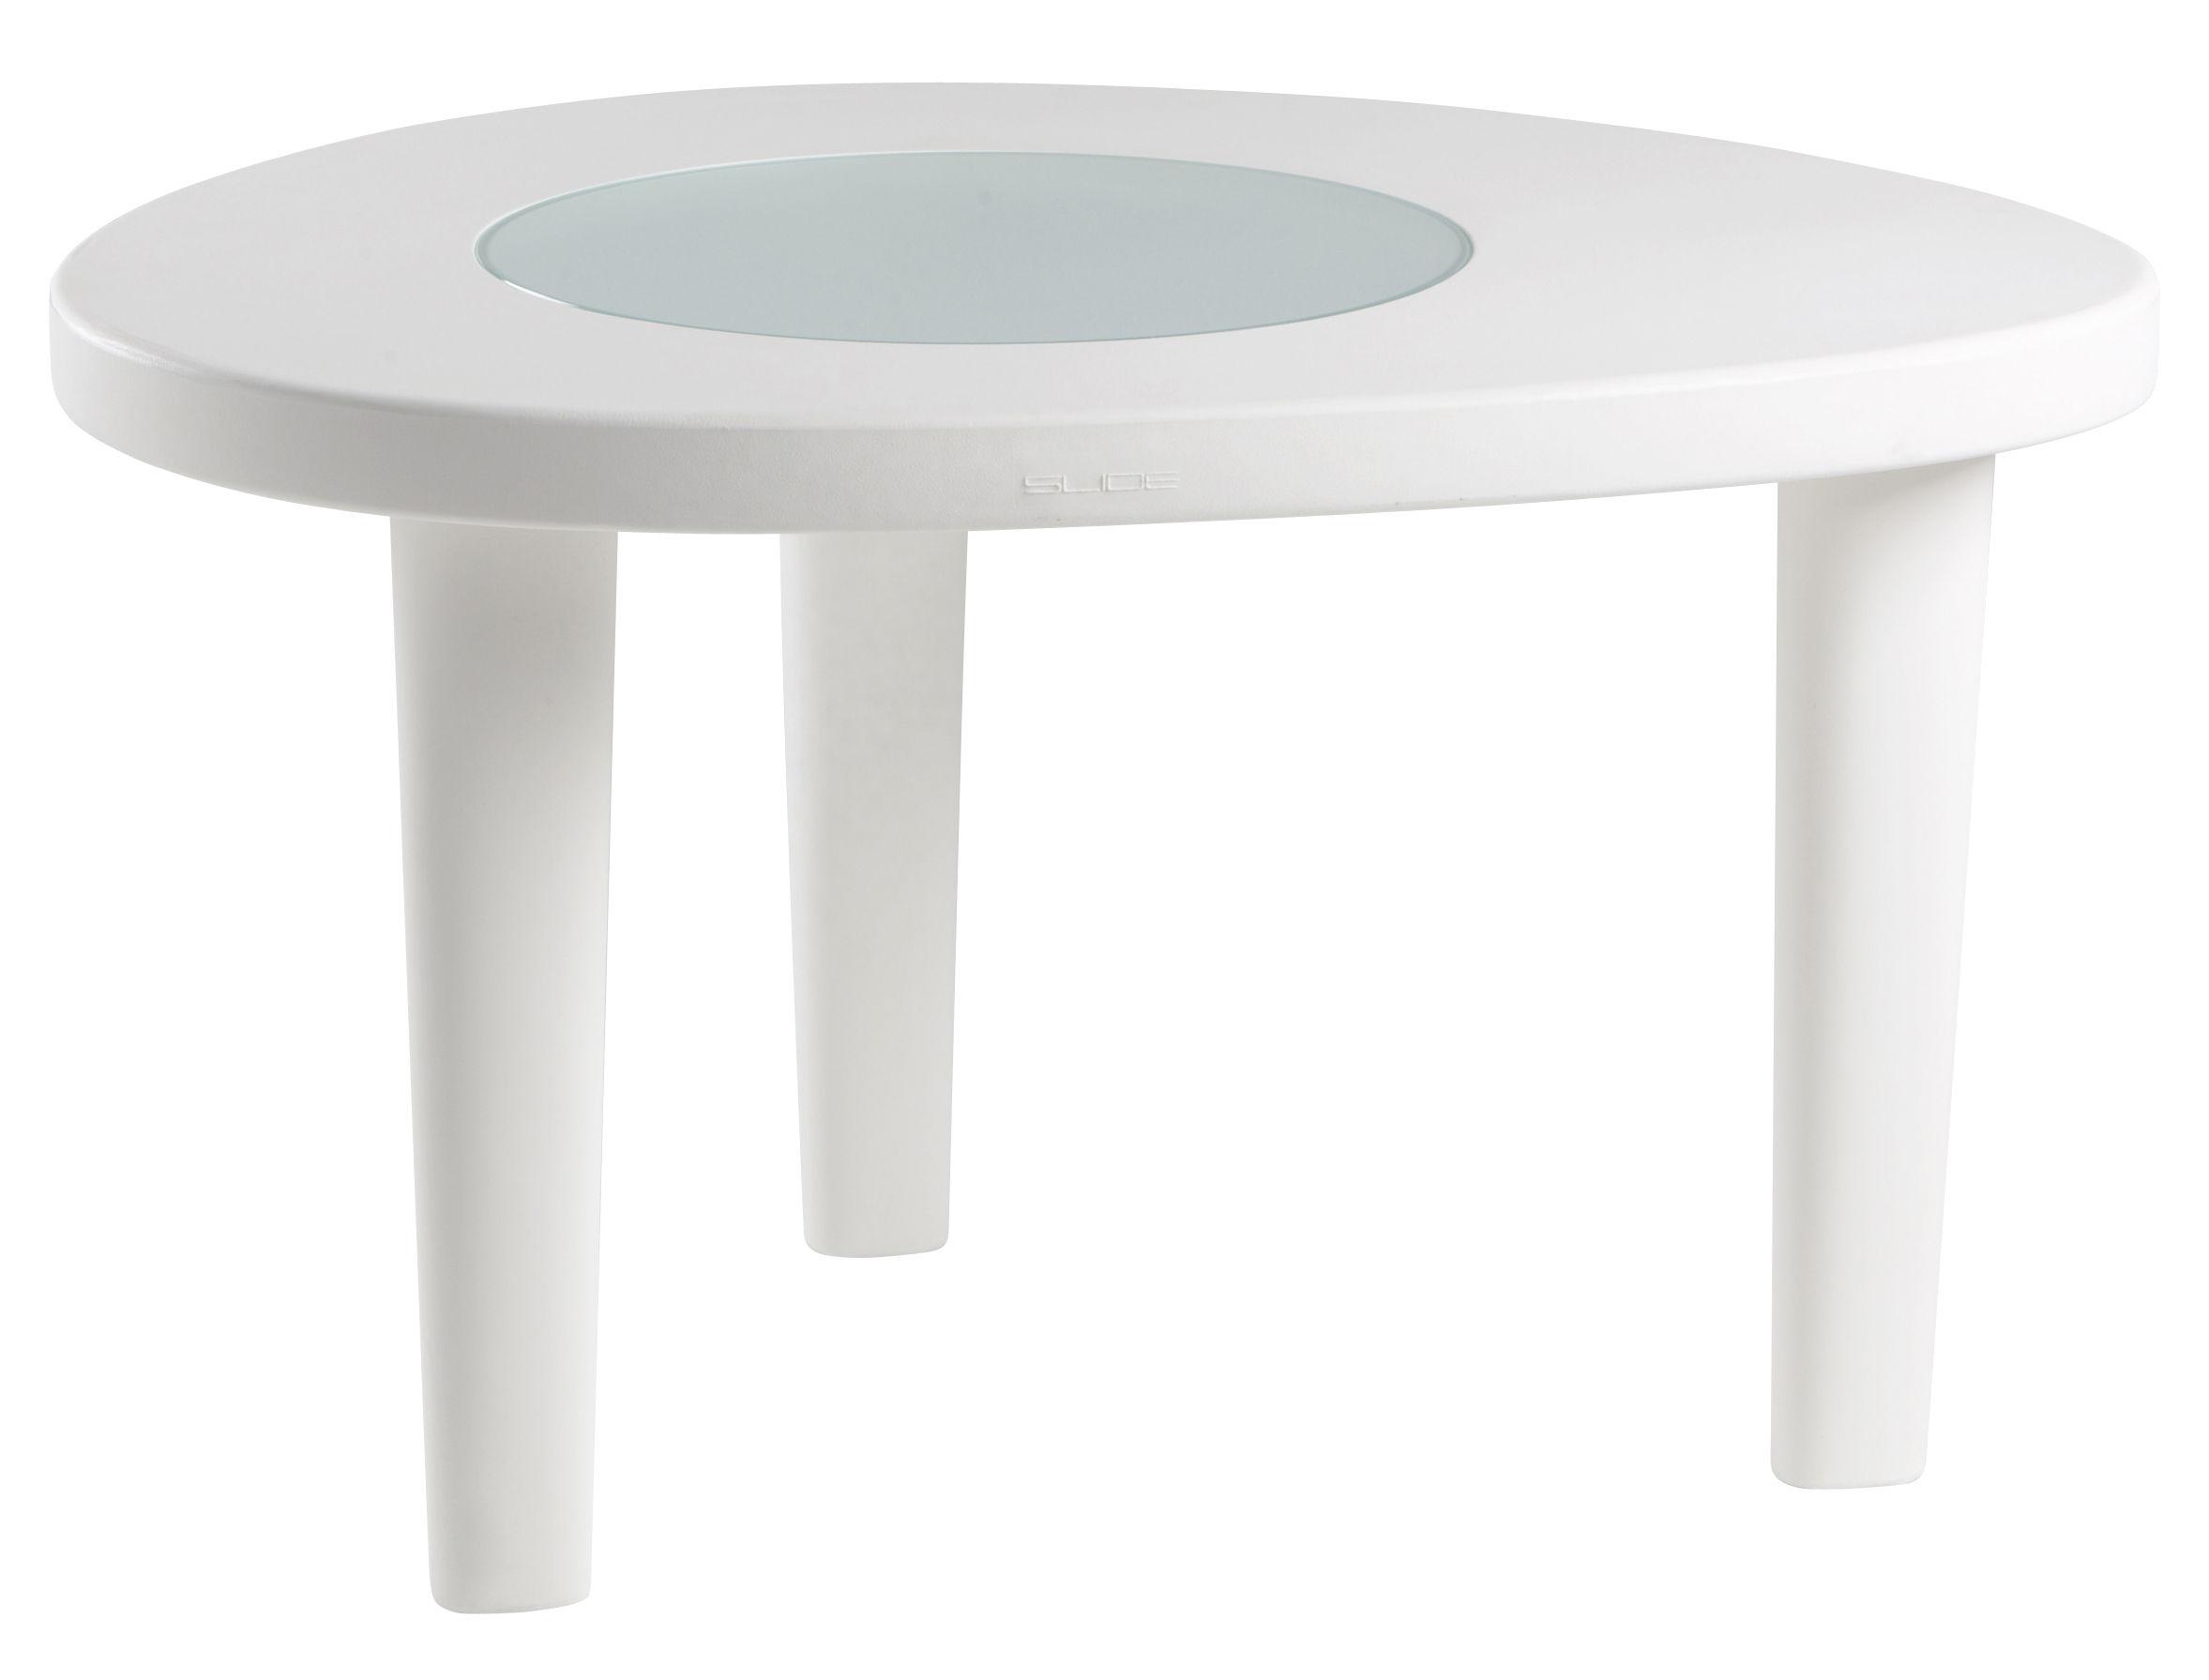 table de jardin coccod 100 x 120 cm plastique verre blanc centre transparent slide. Black Bedroom Furniture Sets. Home Design Ideas